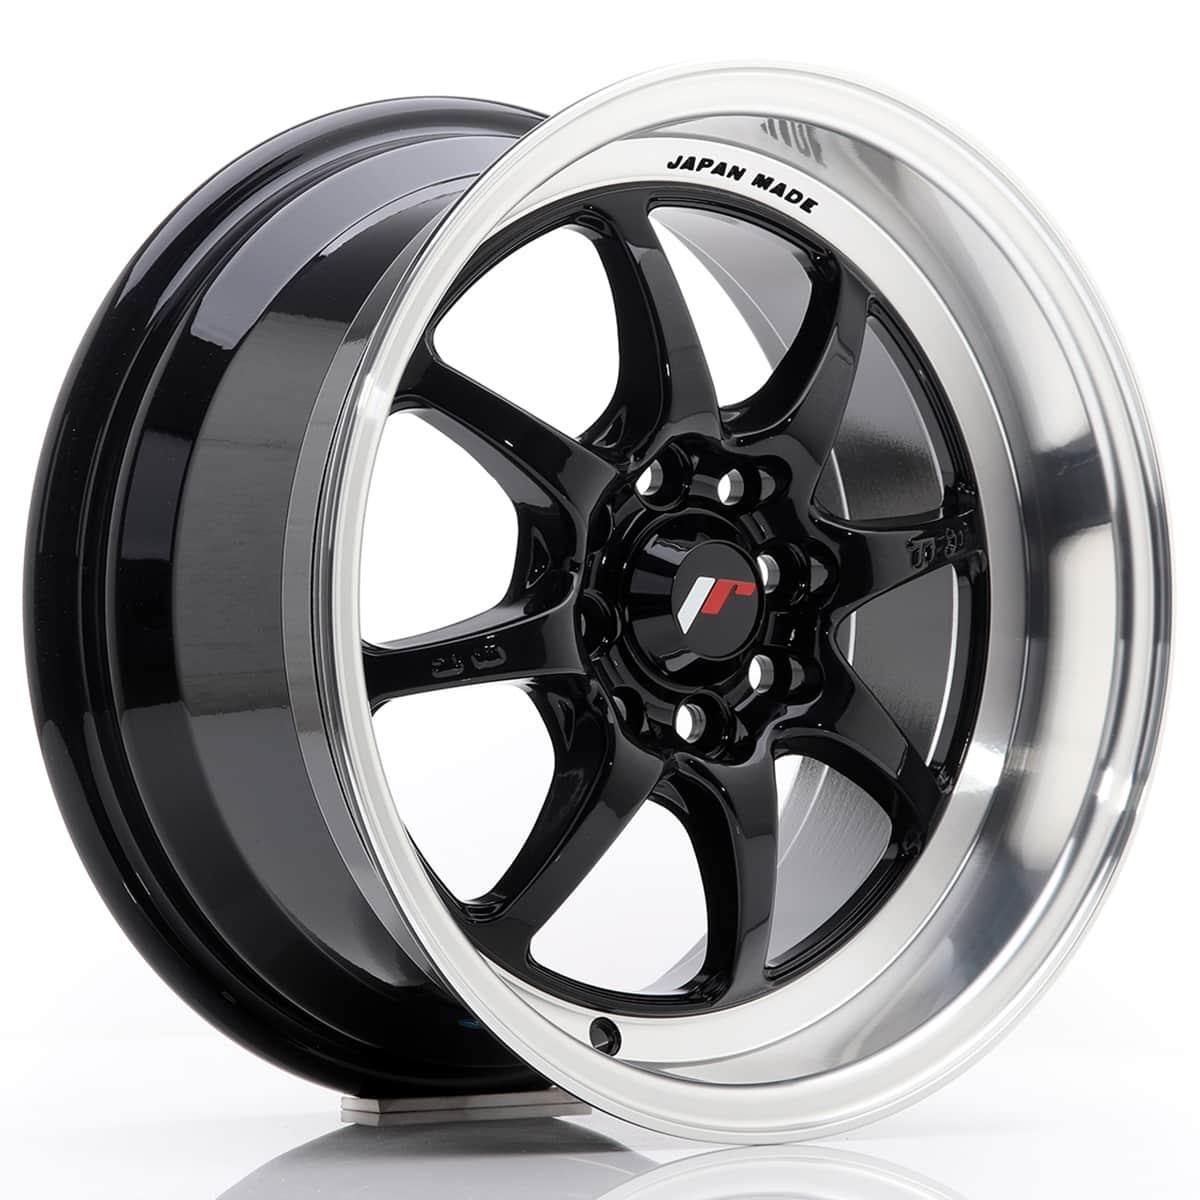 JR Wheels TF2 15x7, 5 ET30 4x100/108 Gloss Black